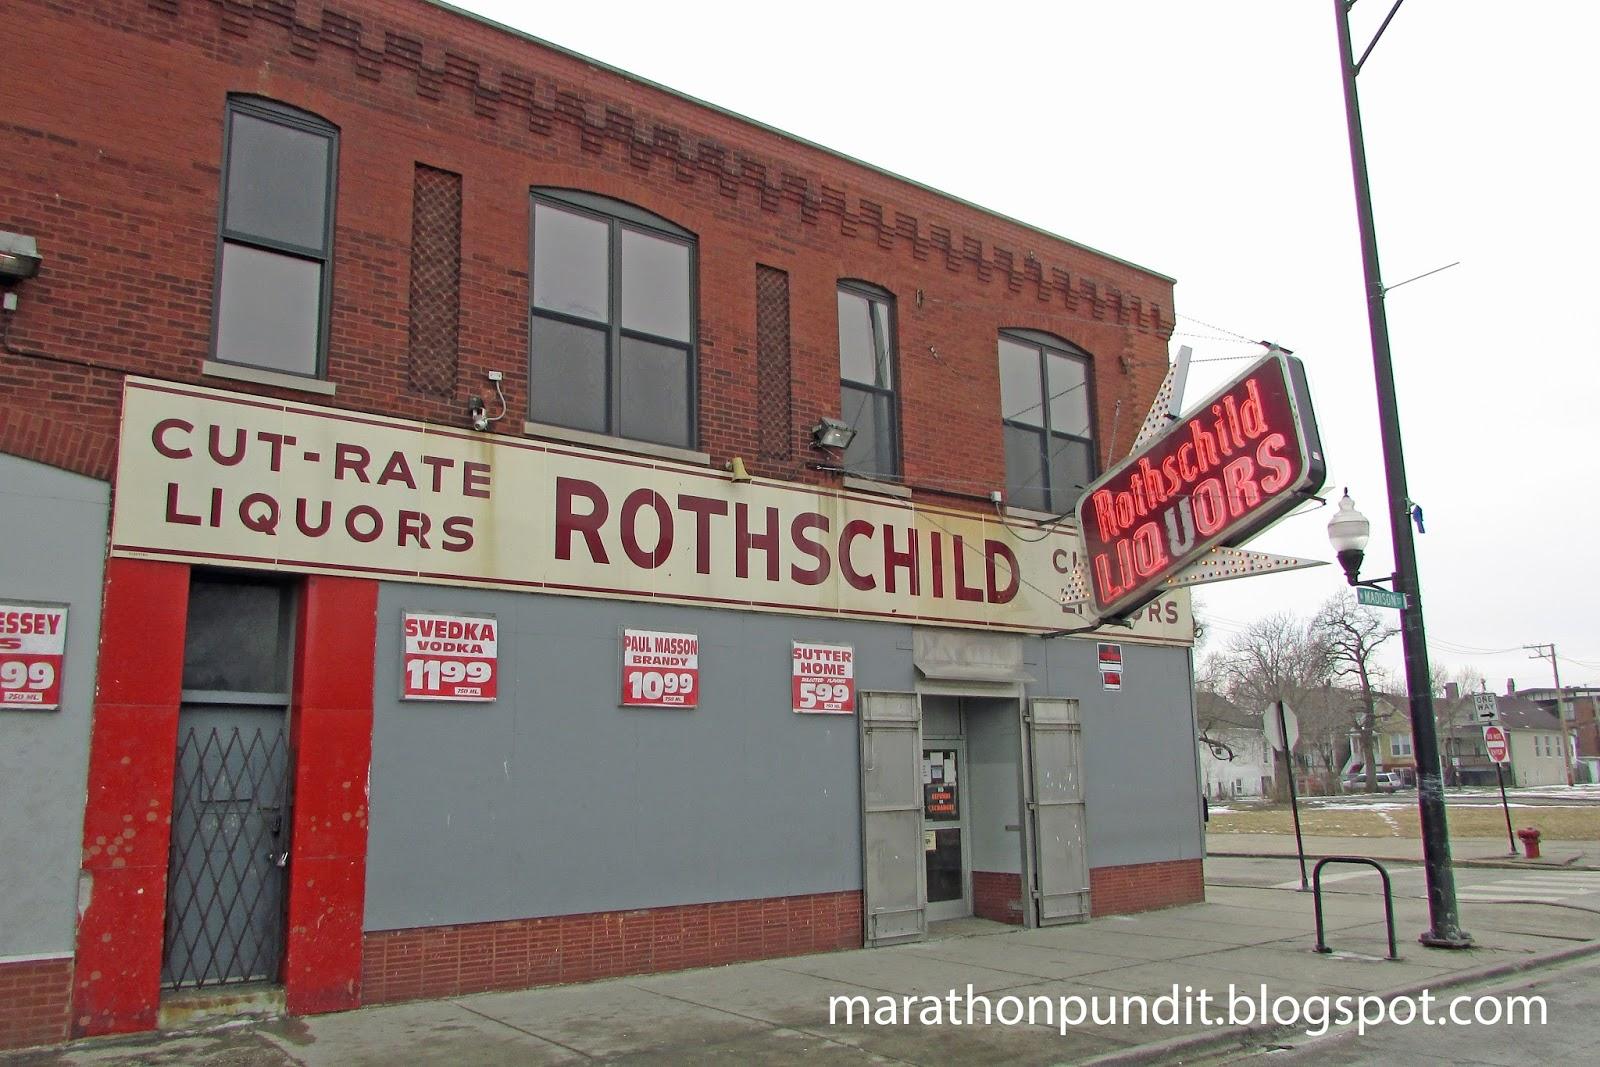 Marathon Pundit Photos Abandoned Homes In Chicago S